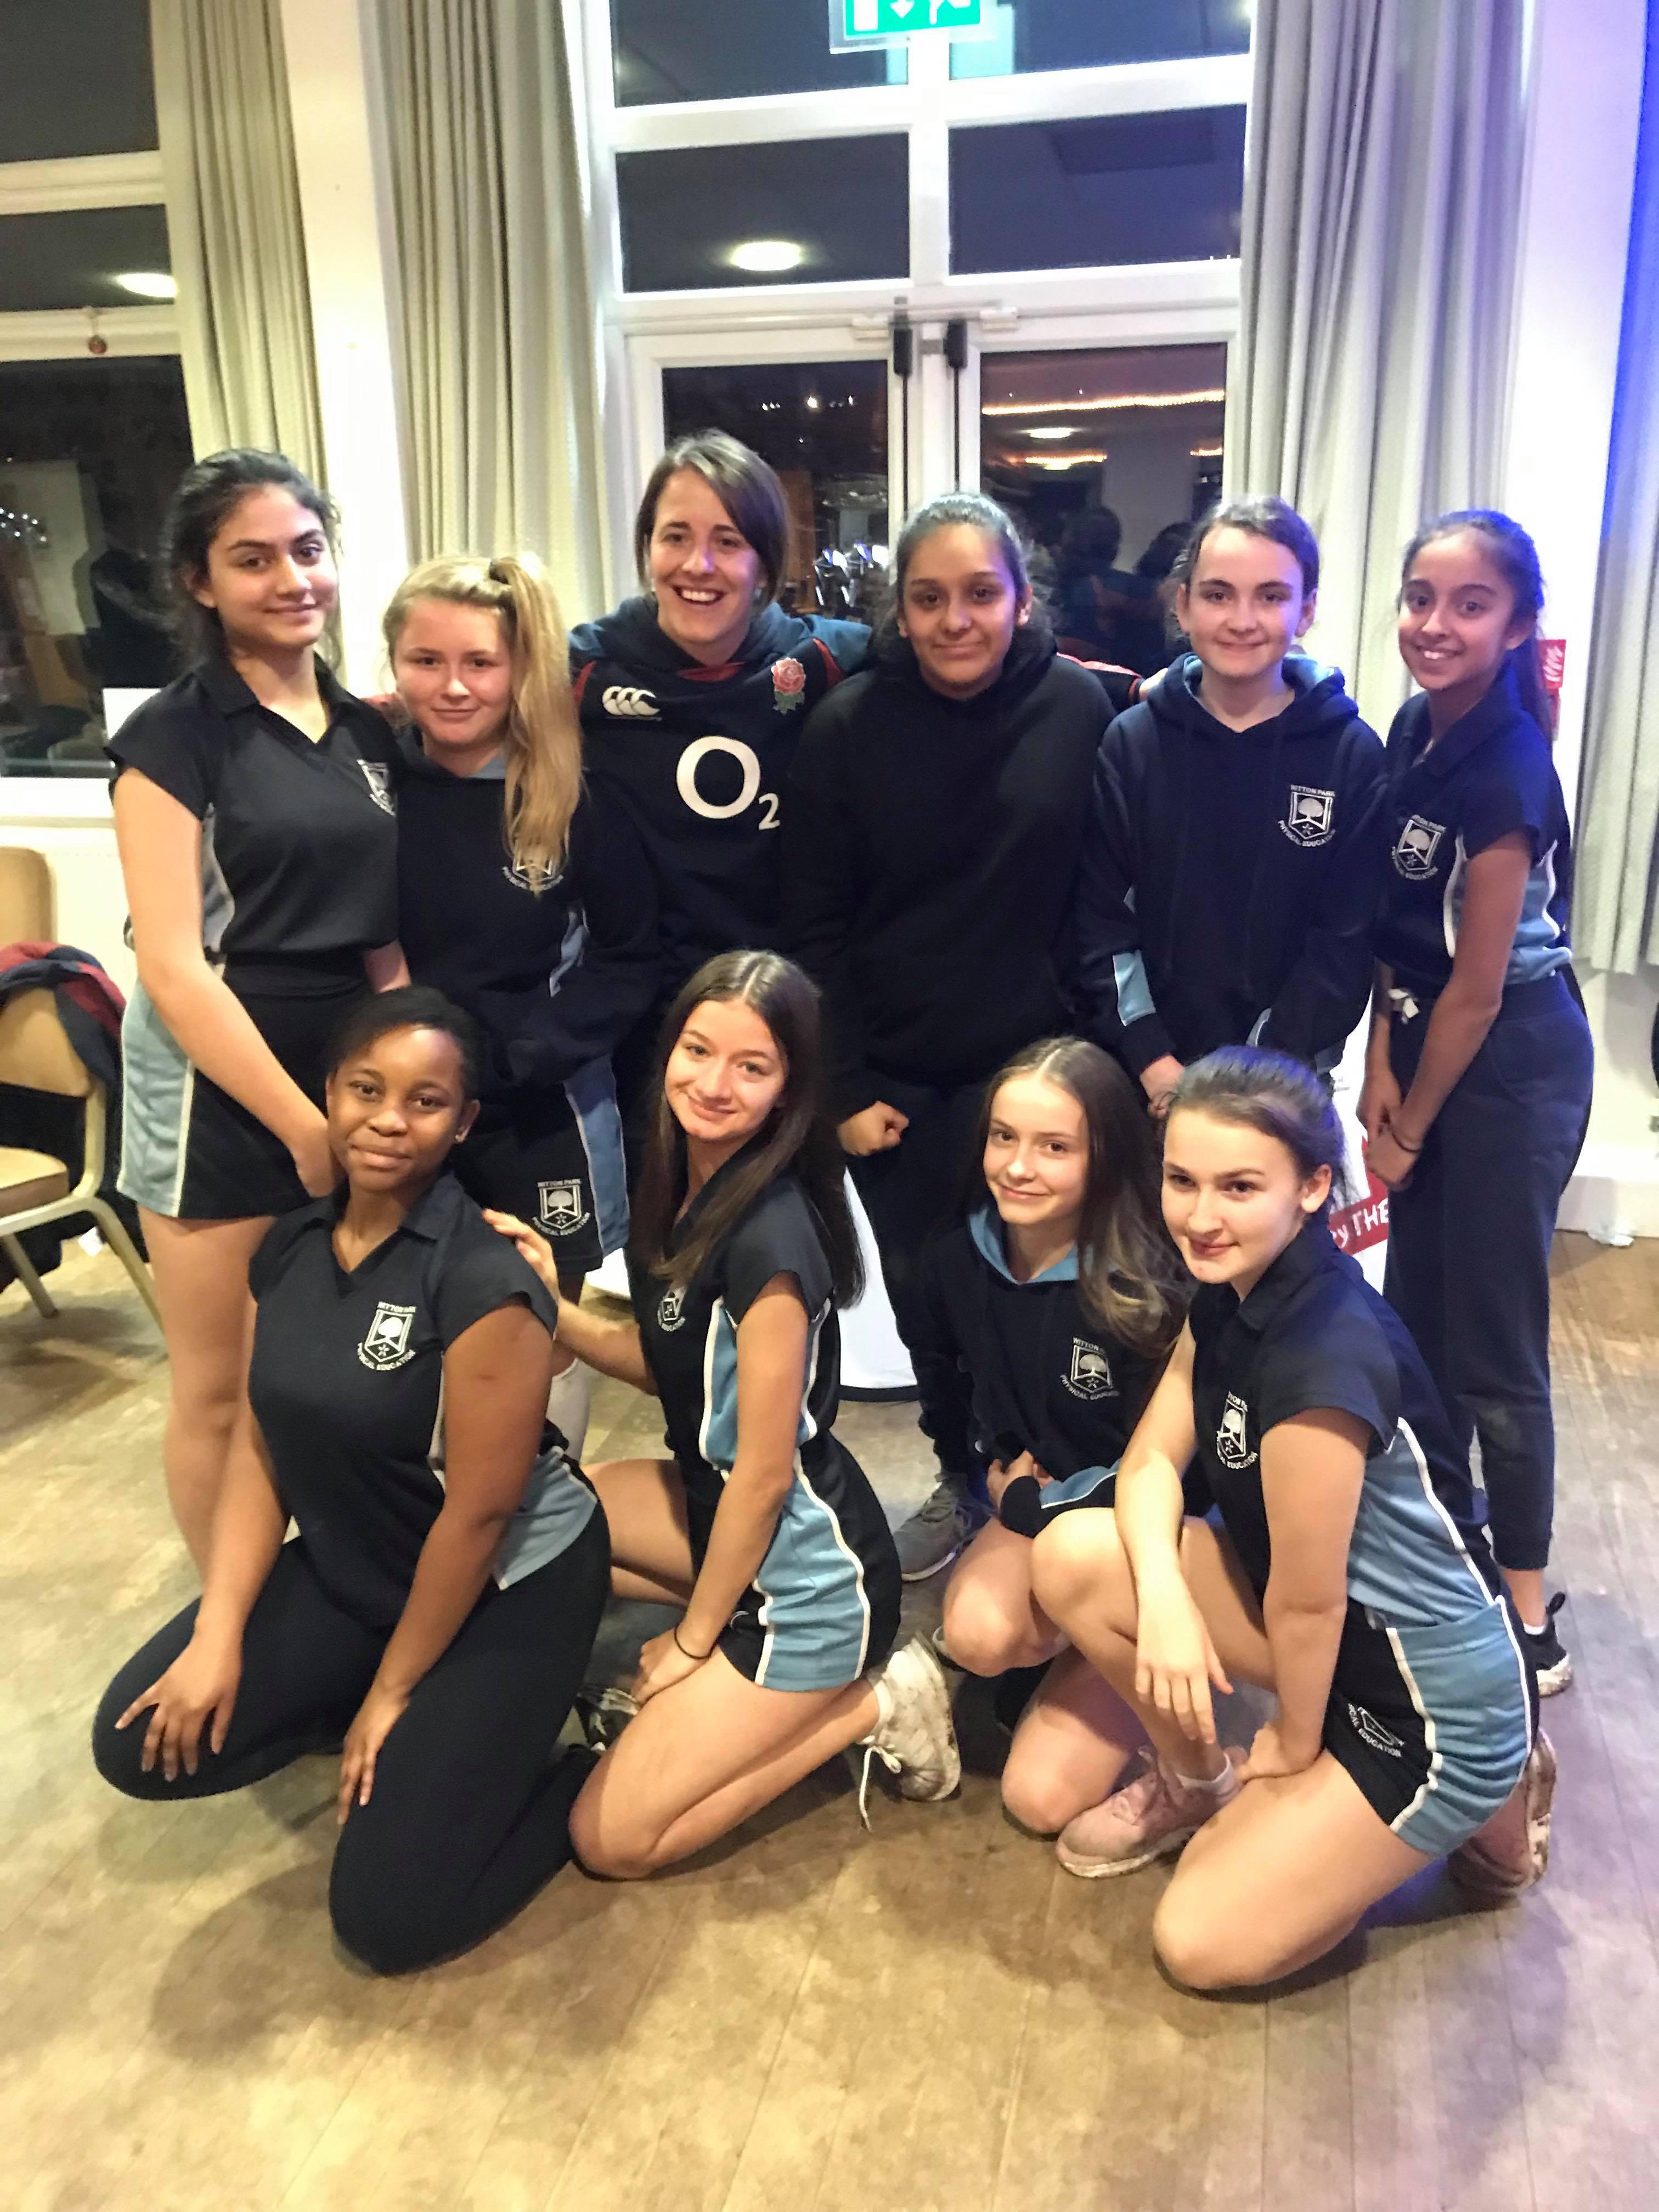 U15's girls Rugby team met Katie Dale McClean former England World Cup captain